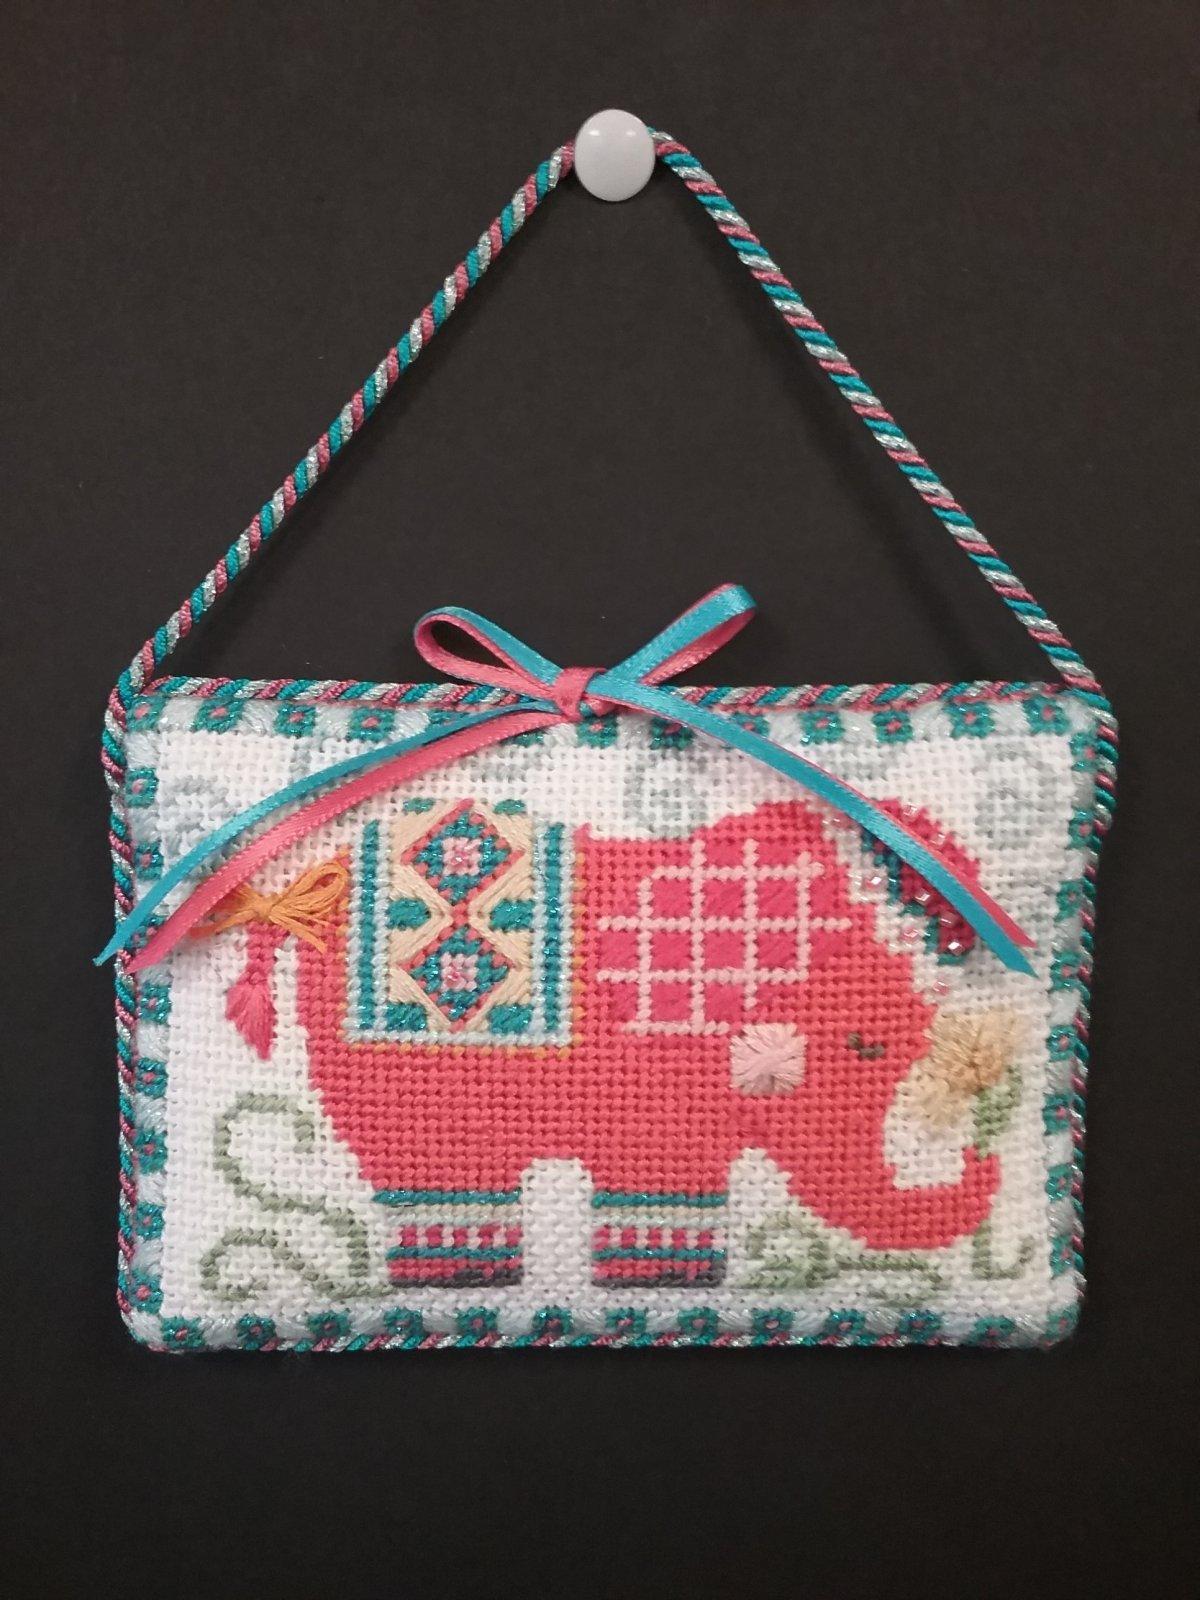 Danji Spring Elephant Ornament- Stitched by Cindy C.